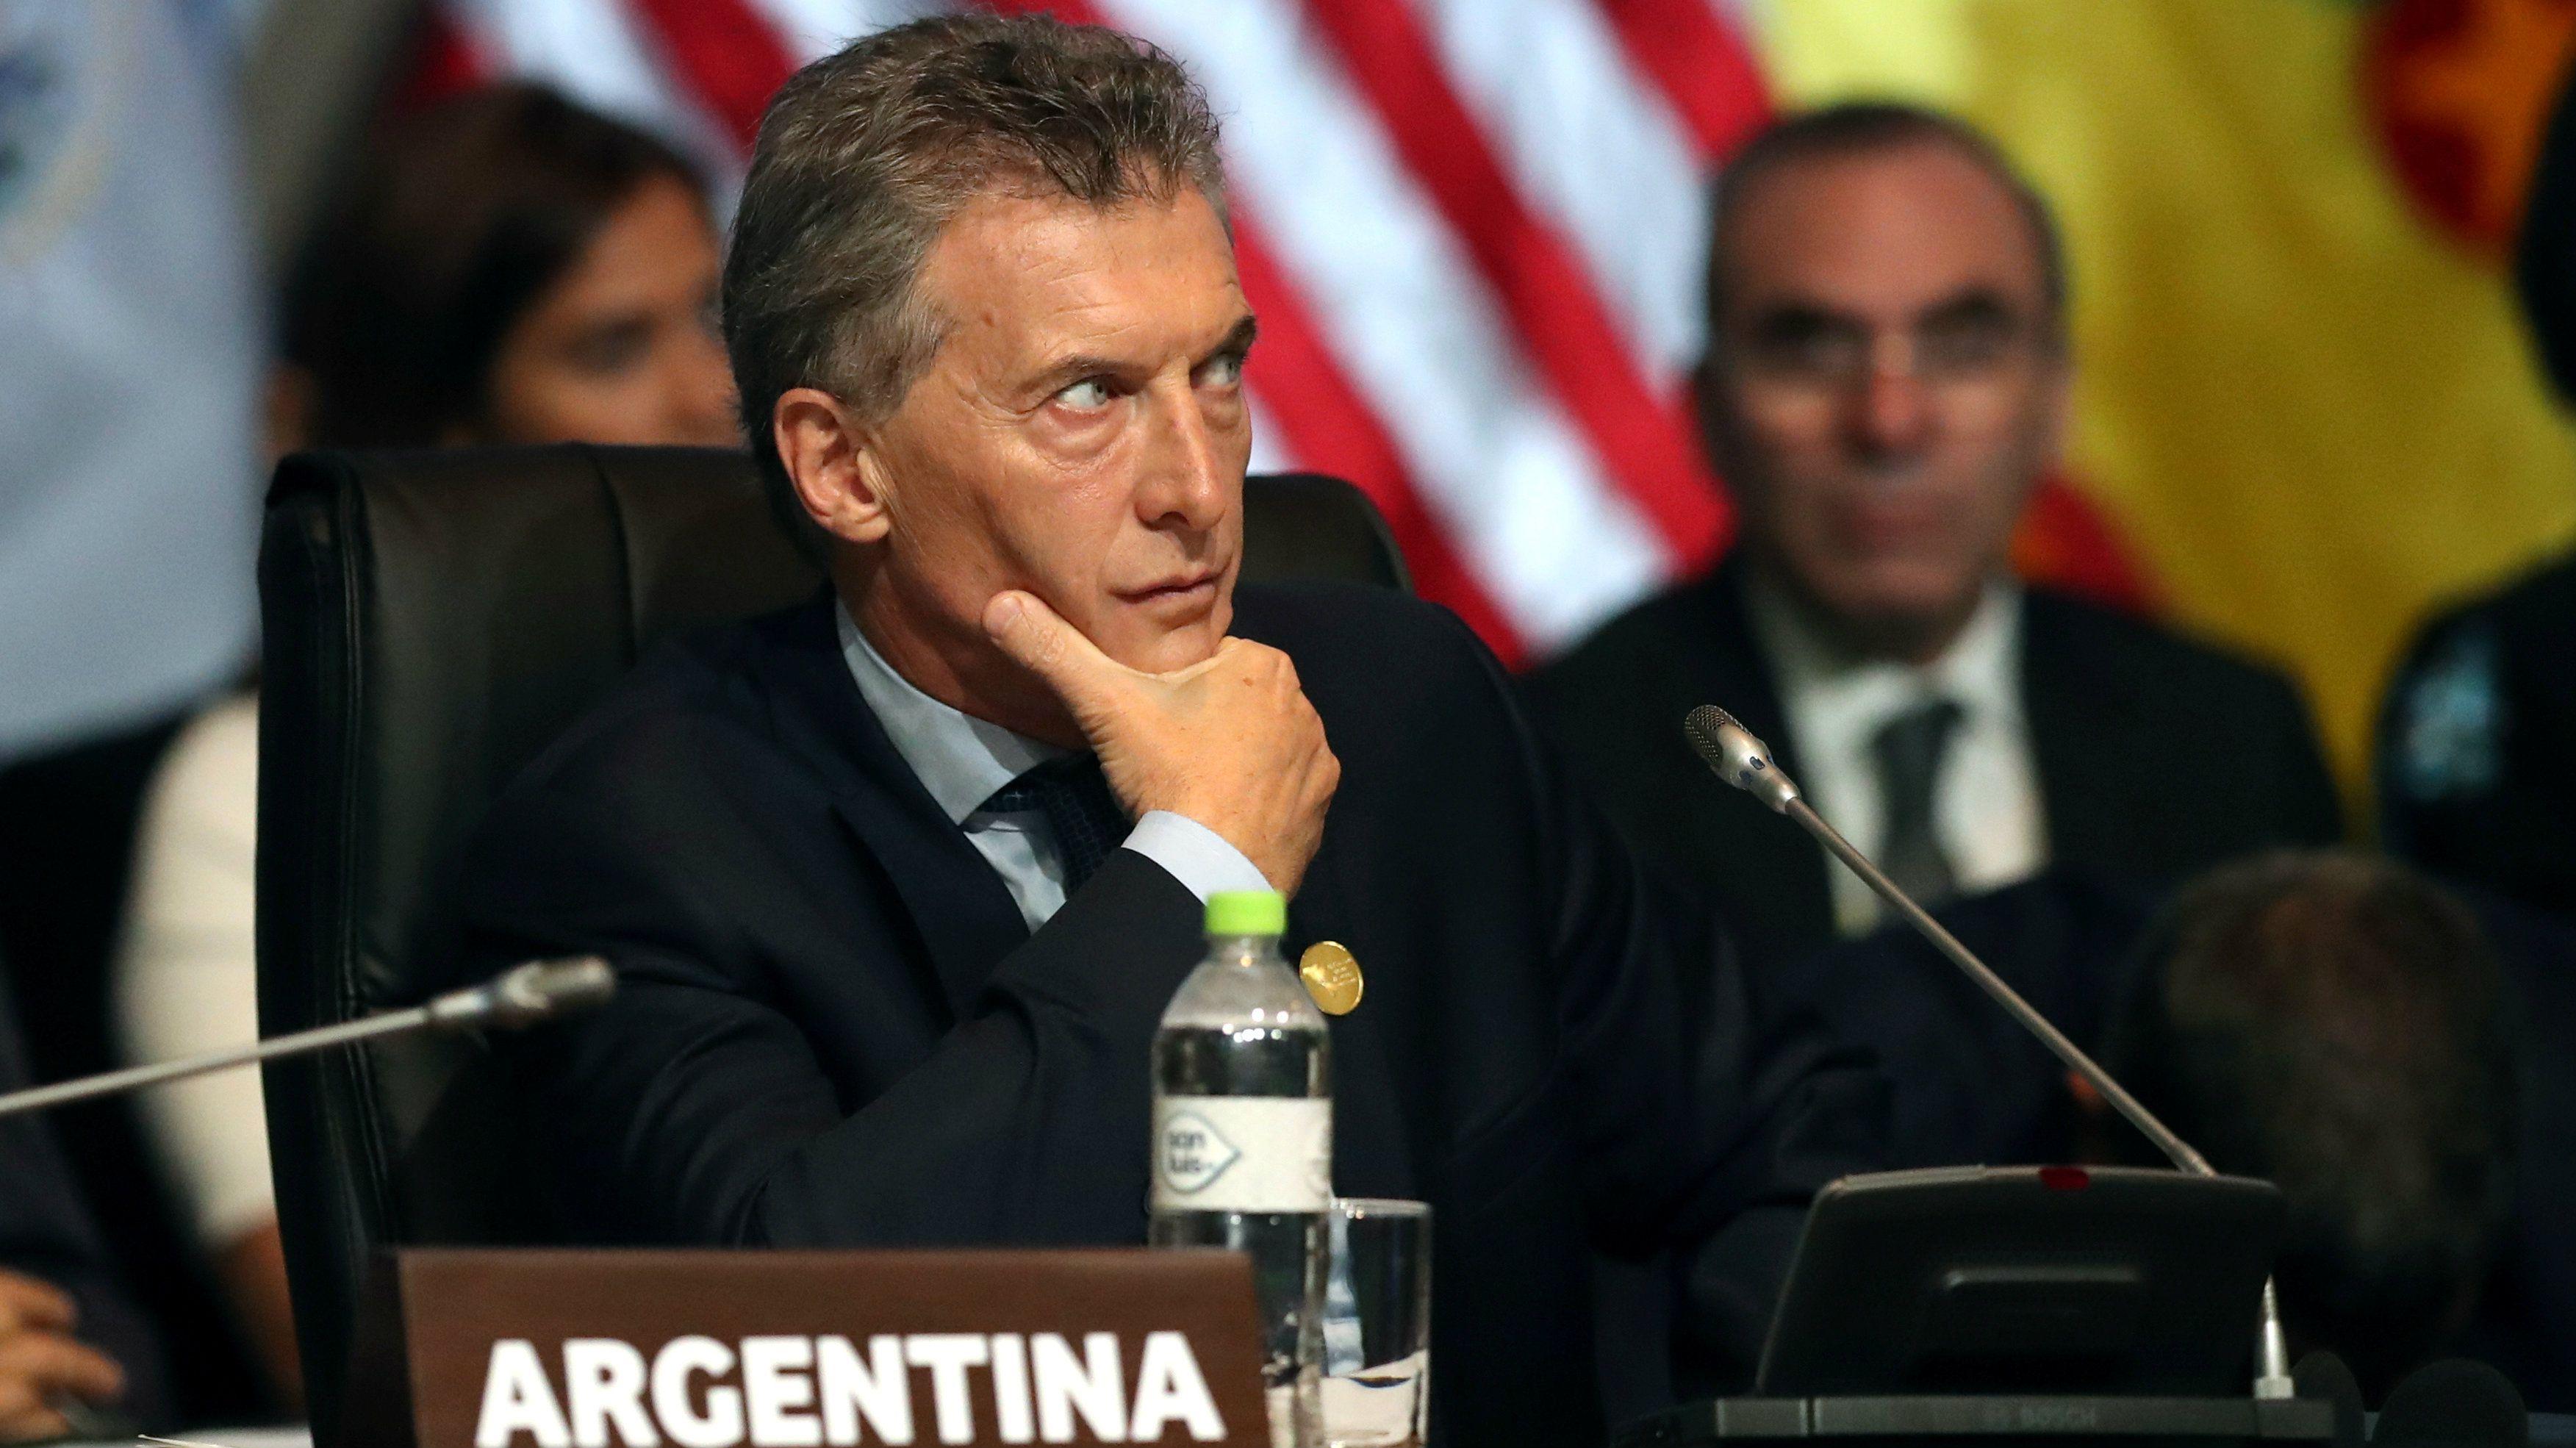 Mauricio Macri, President of Argentina